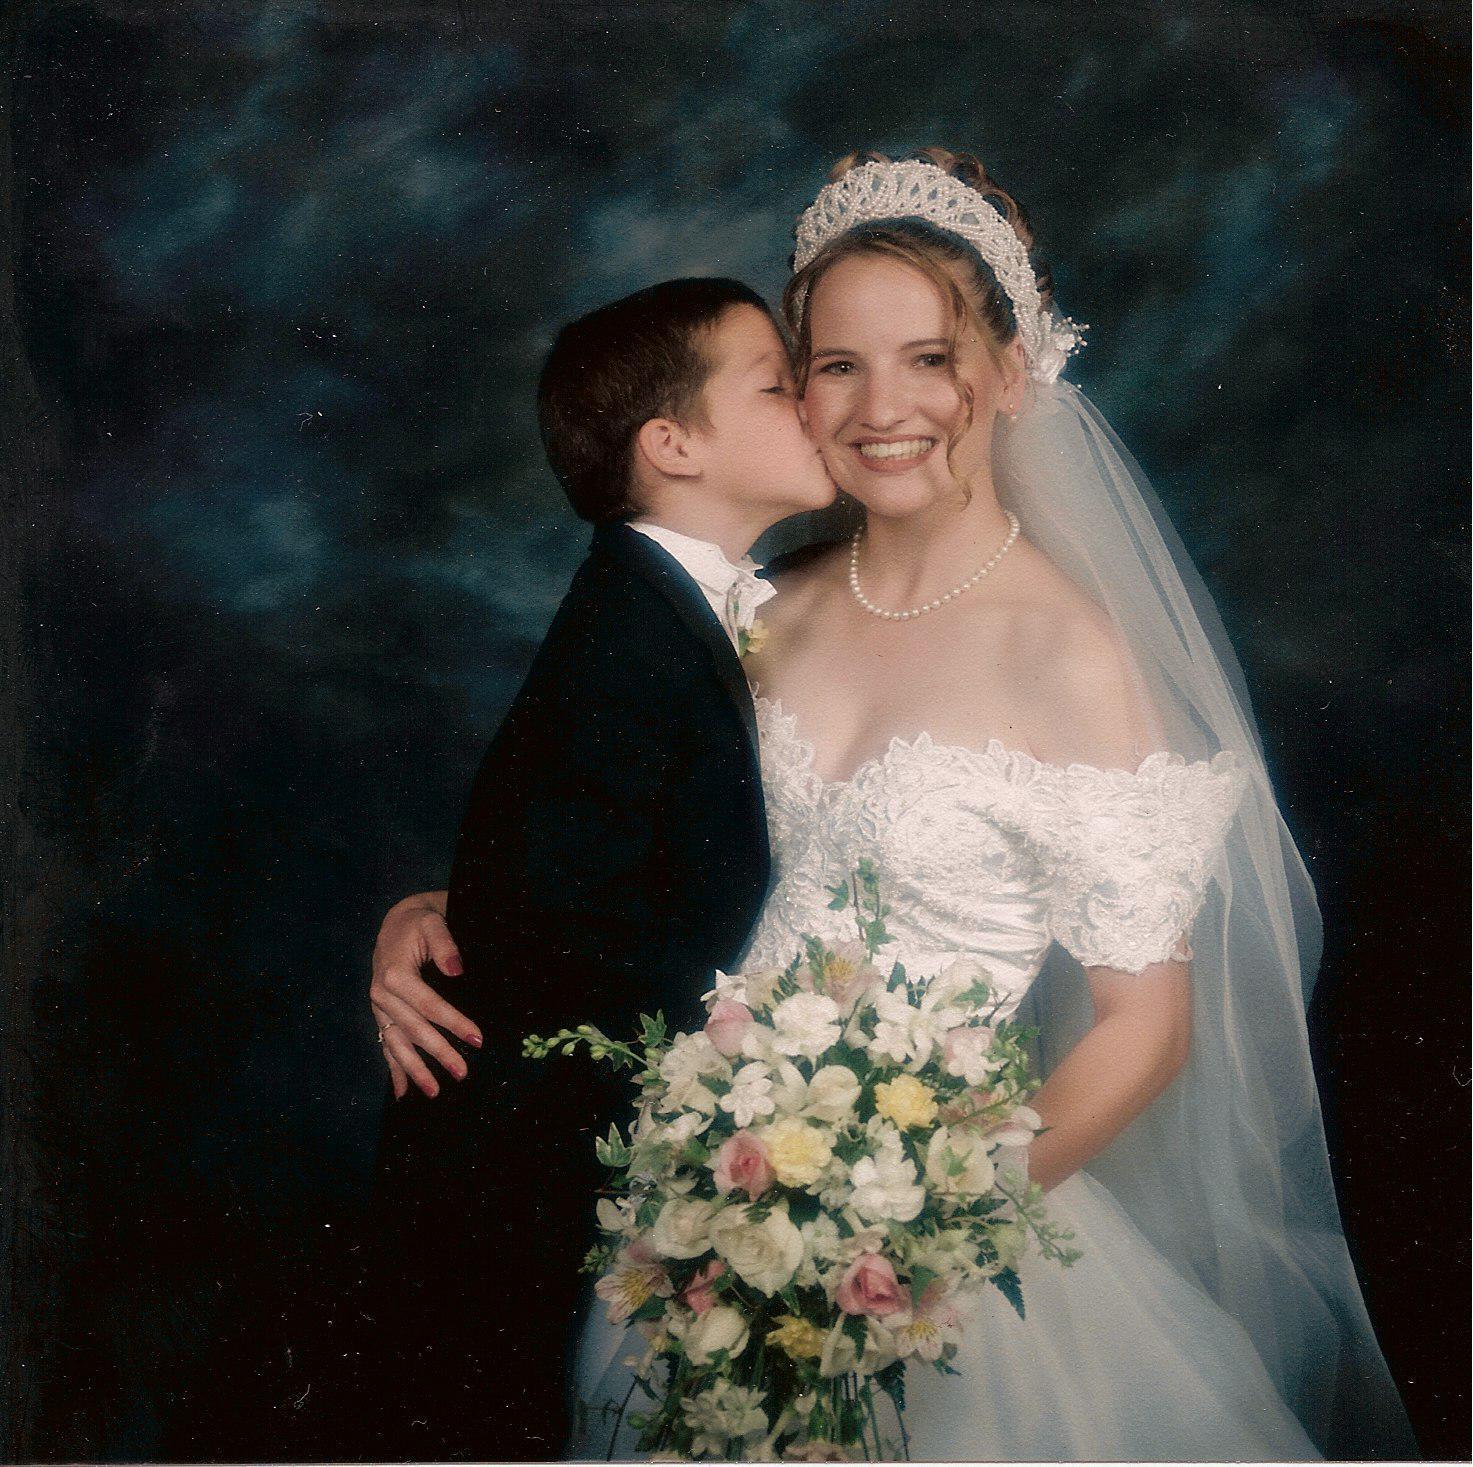 Фото свадьба 1998 год